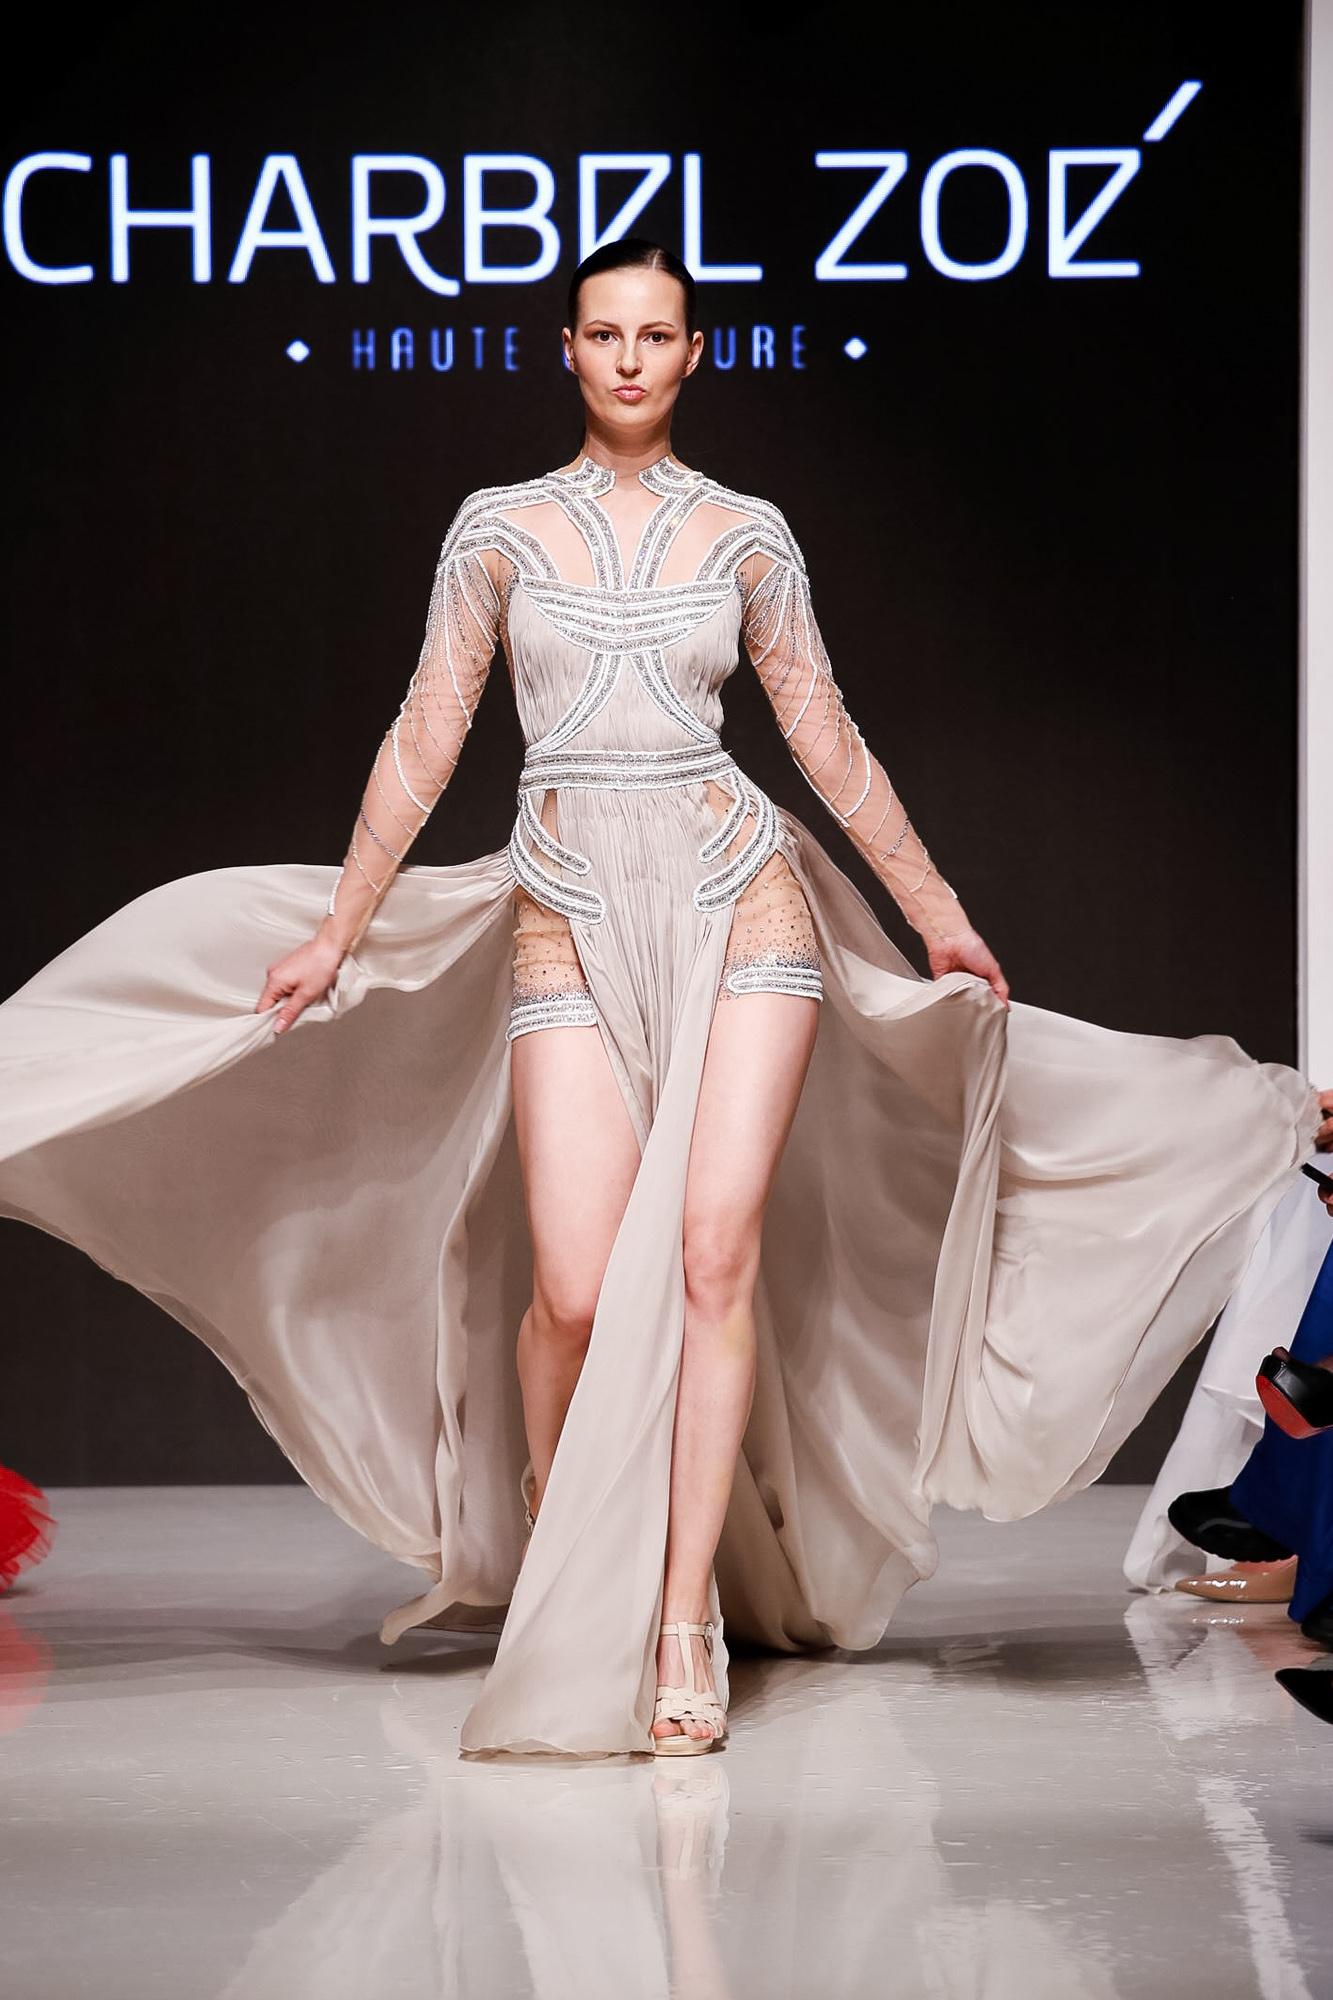 Charbel Zoe fashion show, Arab Fashion Week collection Spring Summer 2020 in Dubai